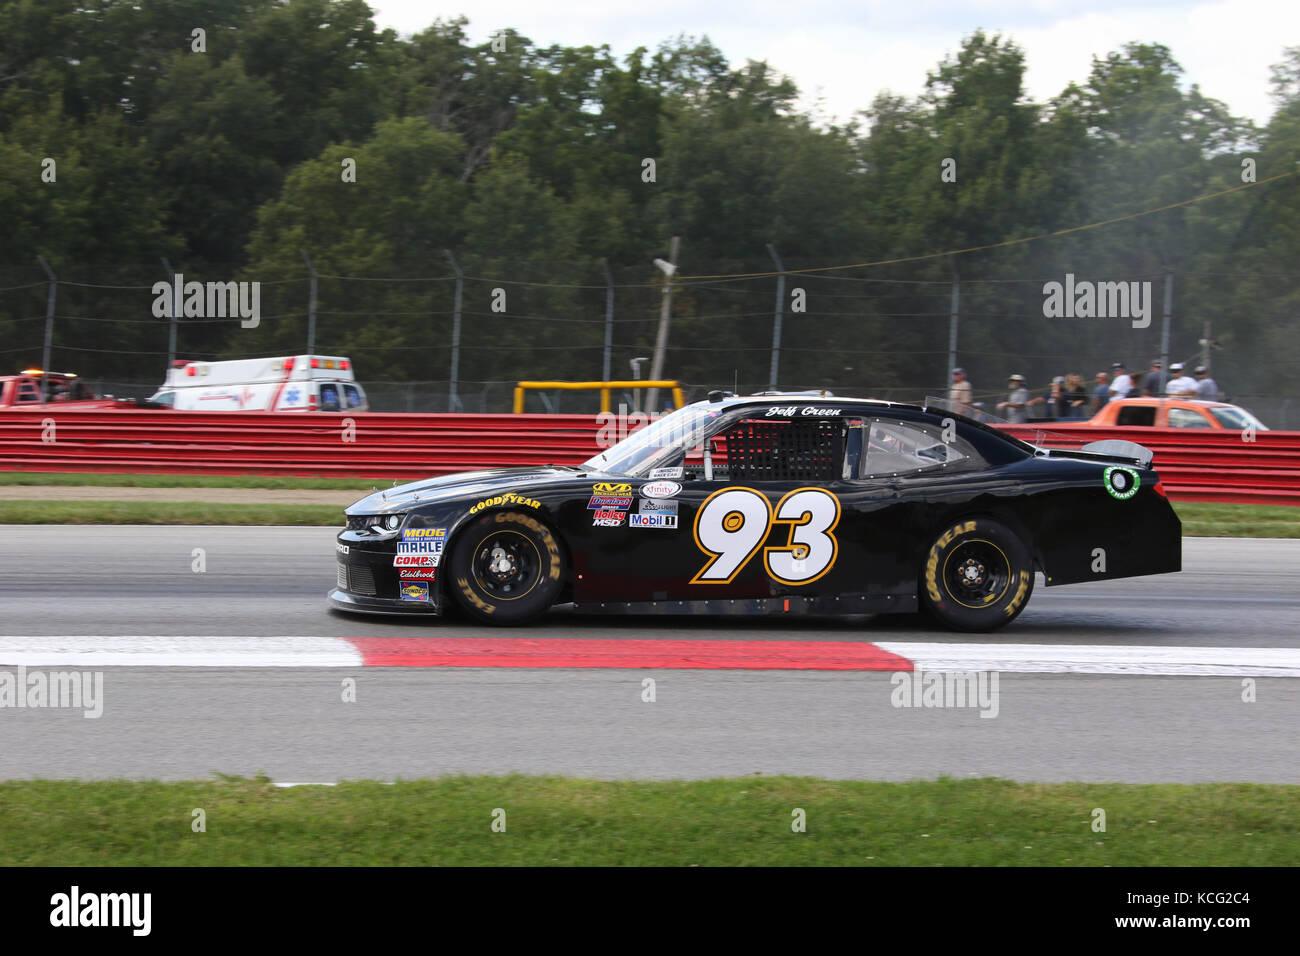 Jeff Green. Auto 93. XFINITY NASCAR Rennen. Mid-Ohio Sports Car Course. Lexington, Mansfield, Ohio, USA. Stockbild